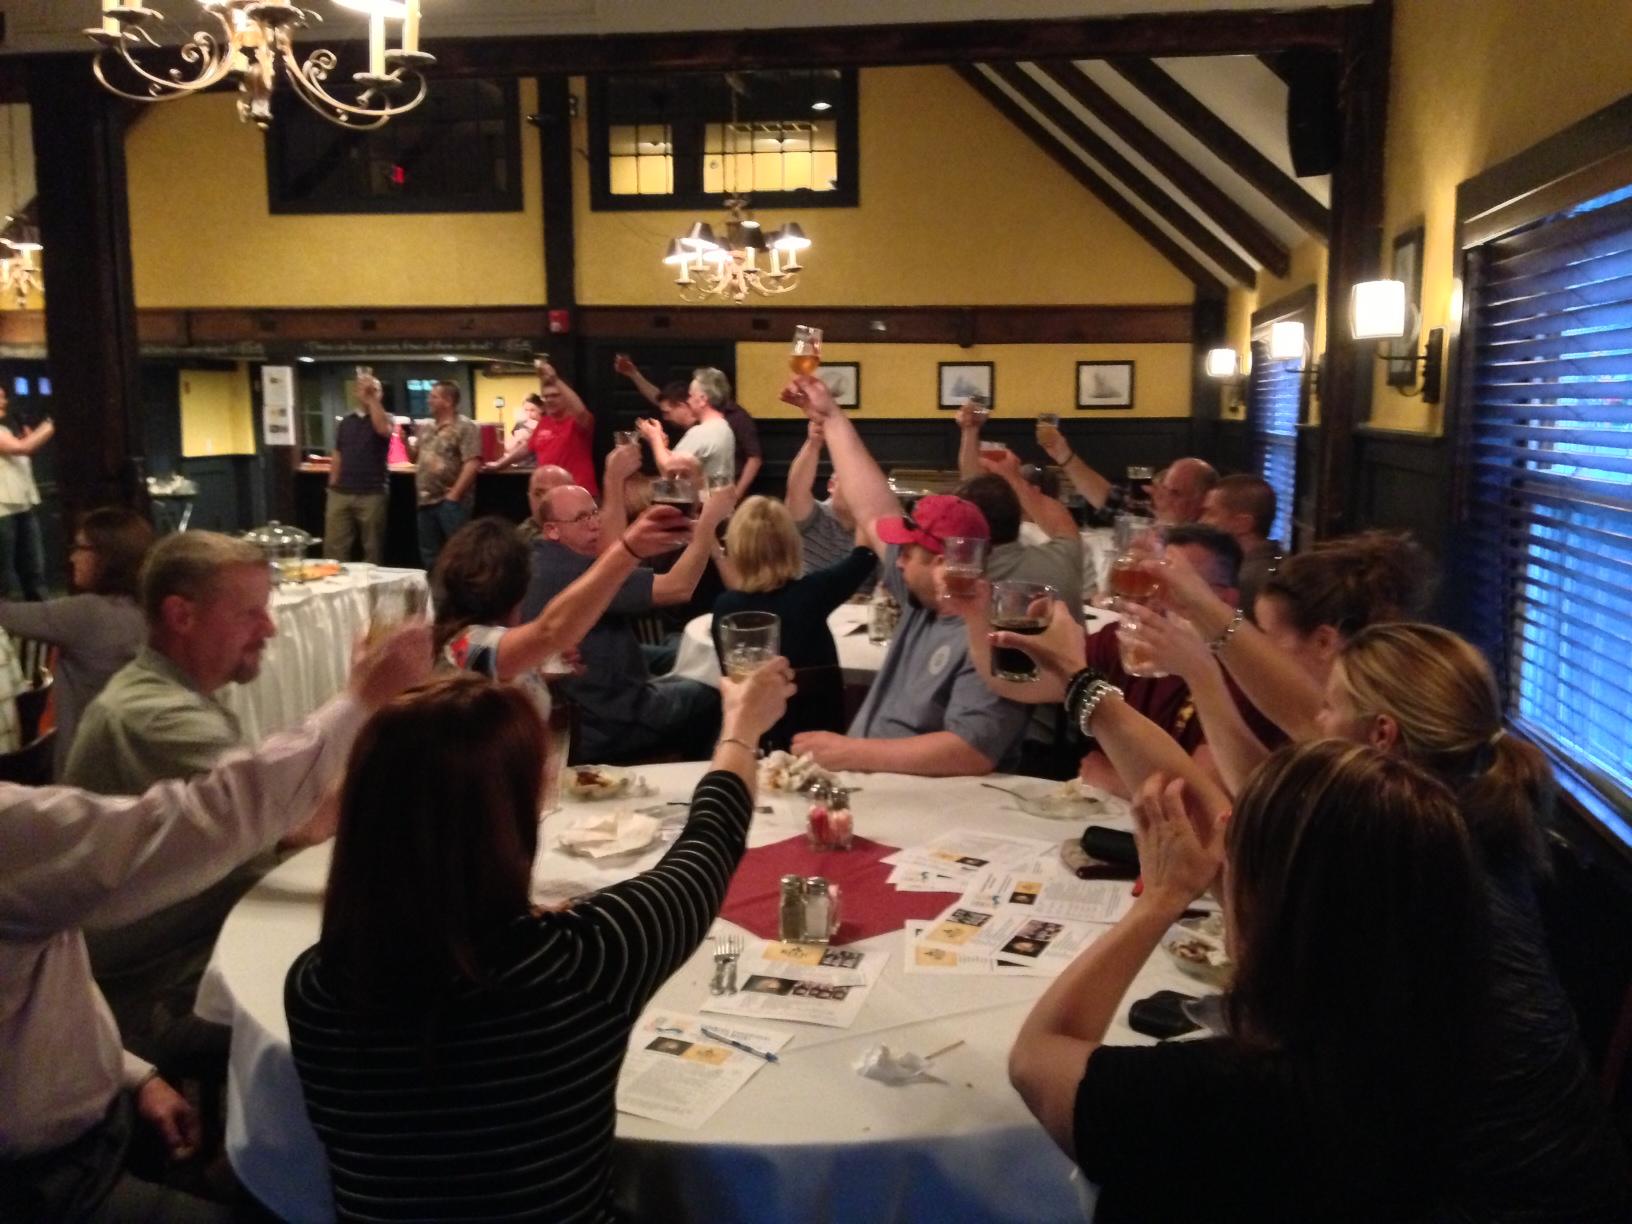 J. Timothy's Taverne Celebrates Connecticut Beer Week